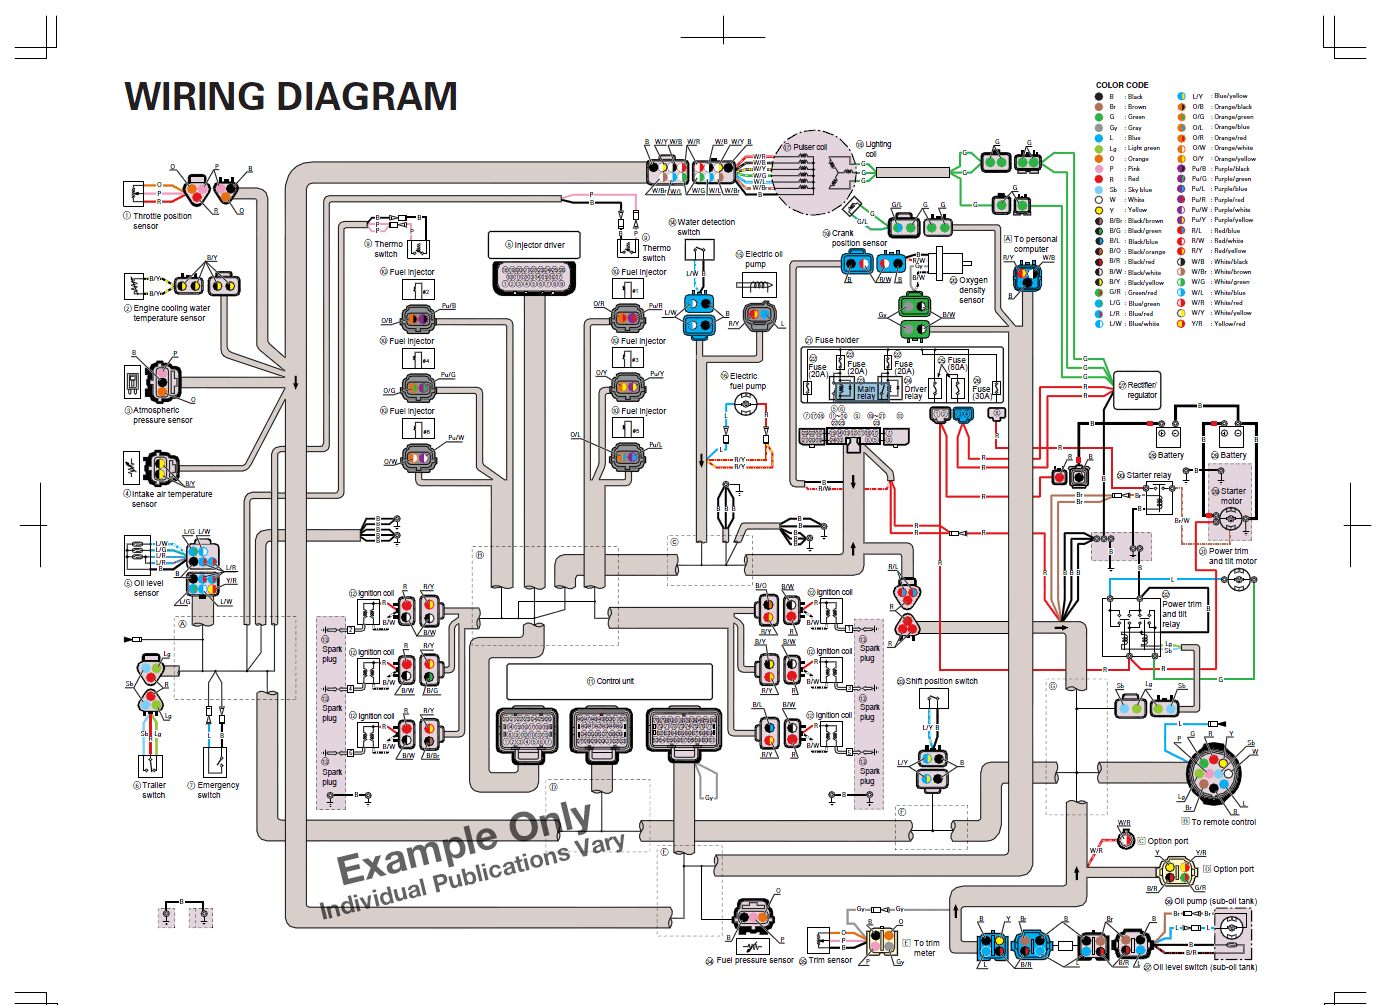 2008 Polaris Outlaw 525 Wiring Diagram Sample2